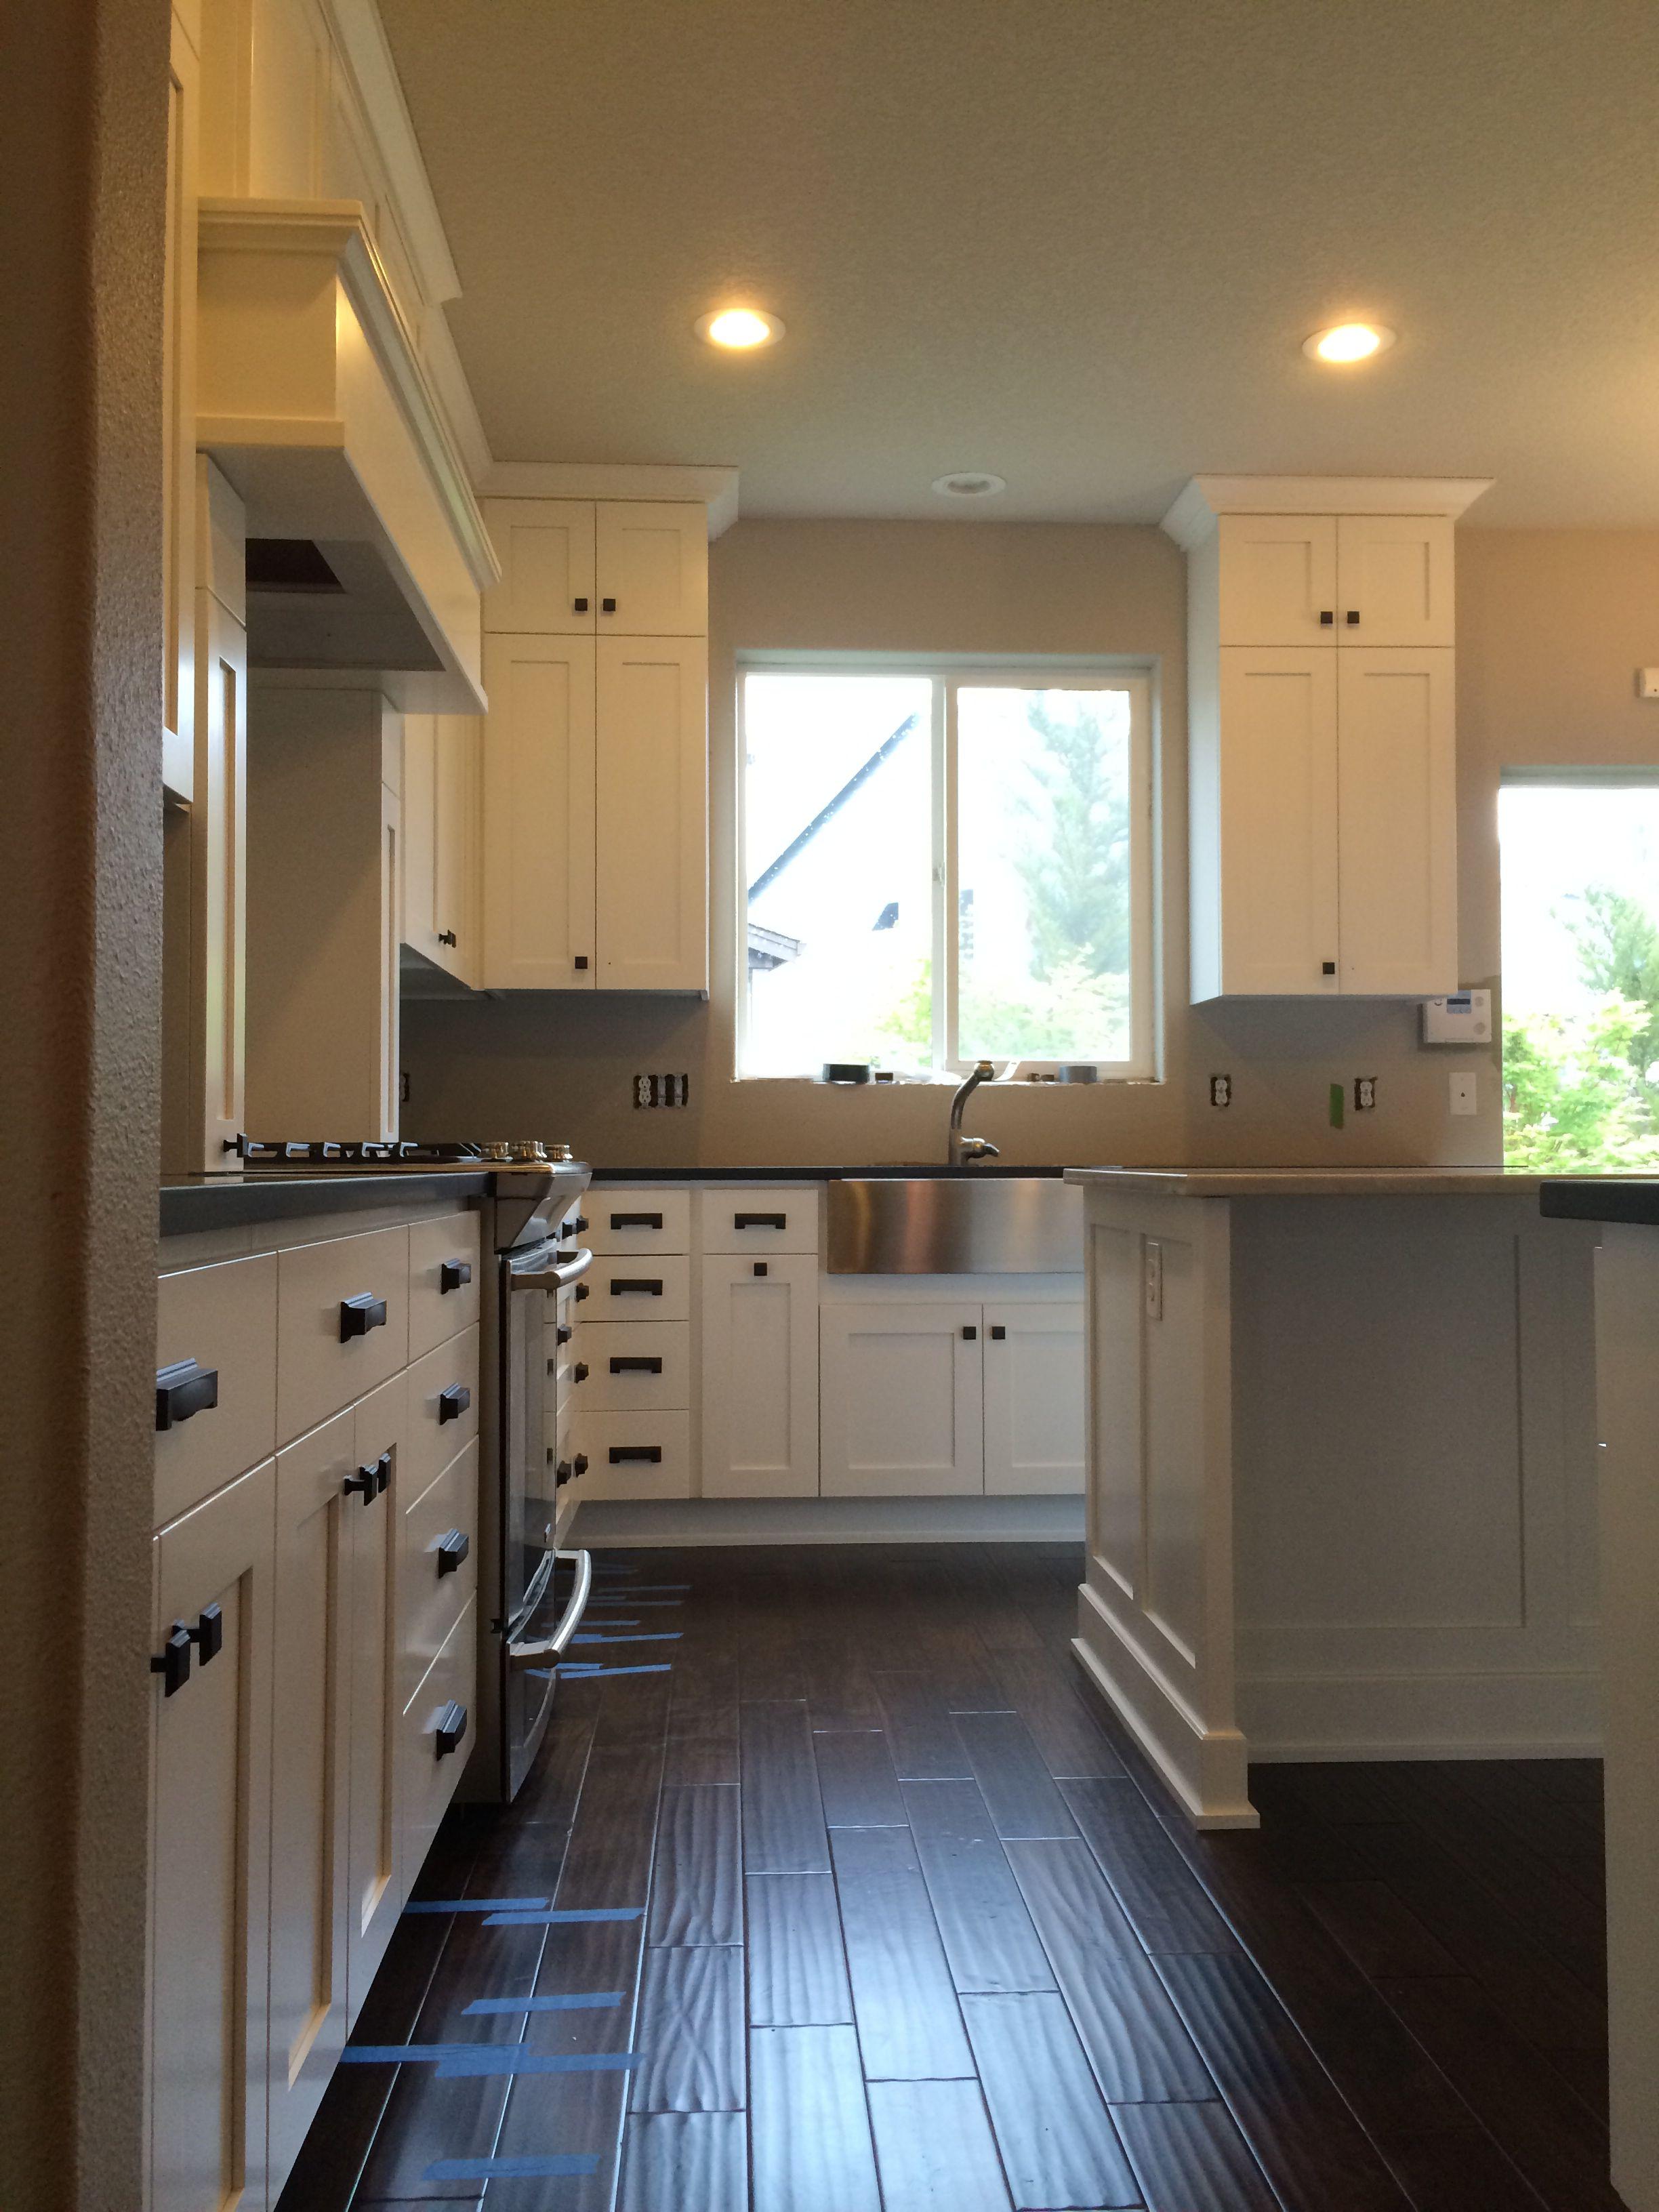 Kitchen Remodel White Shaker Cabinets, Absolute Black Honed Granite, Bianco